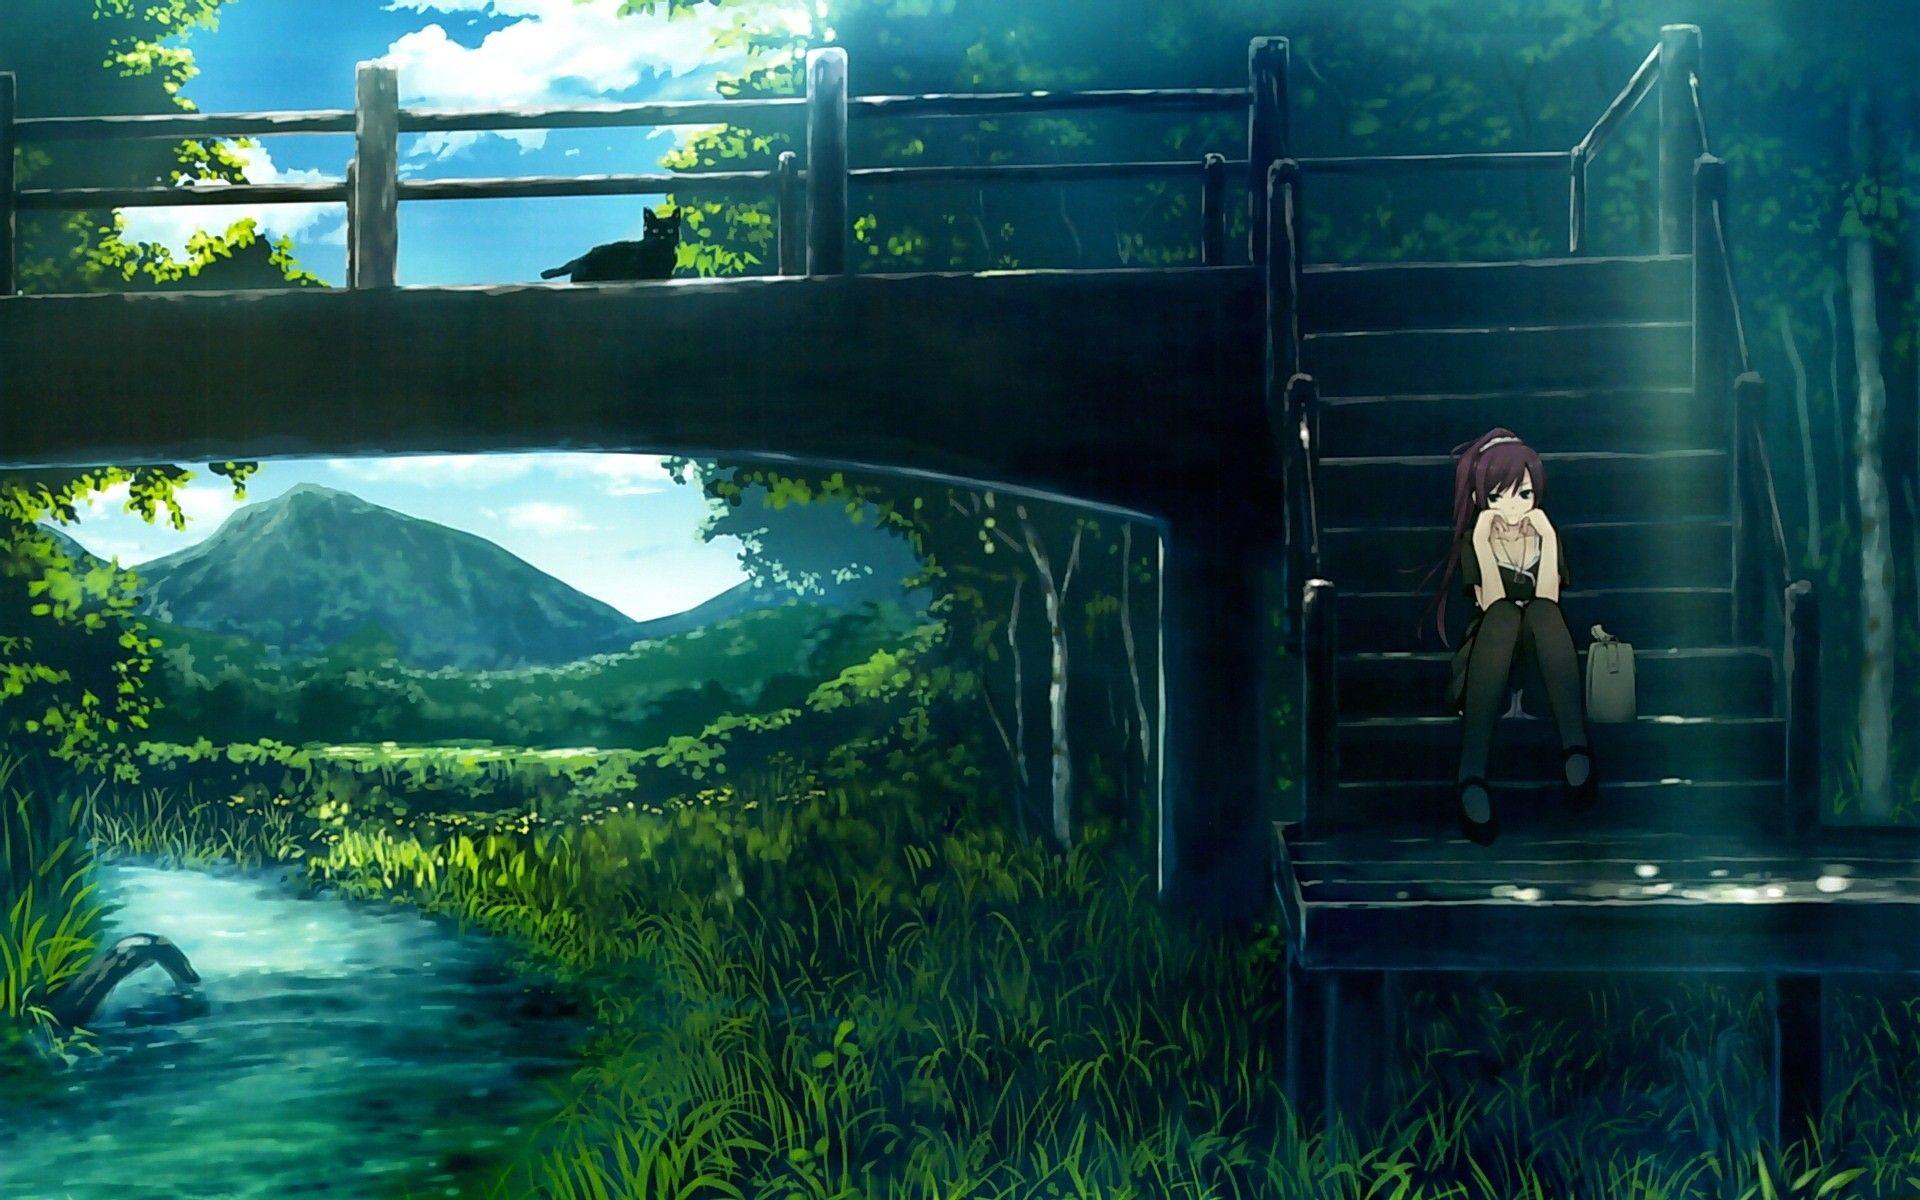 Nature Anime Scenery Anime Scenery Wallpaper Anime Background